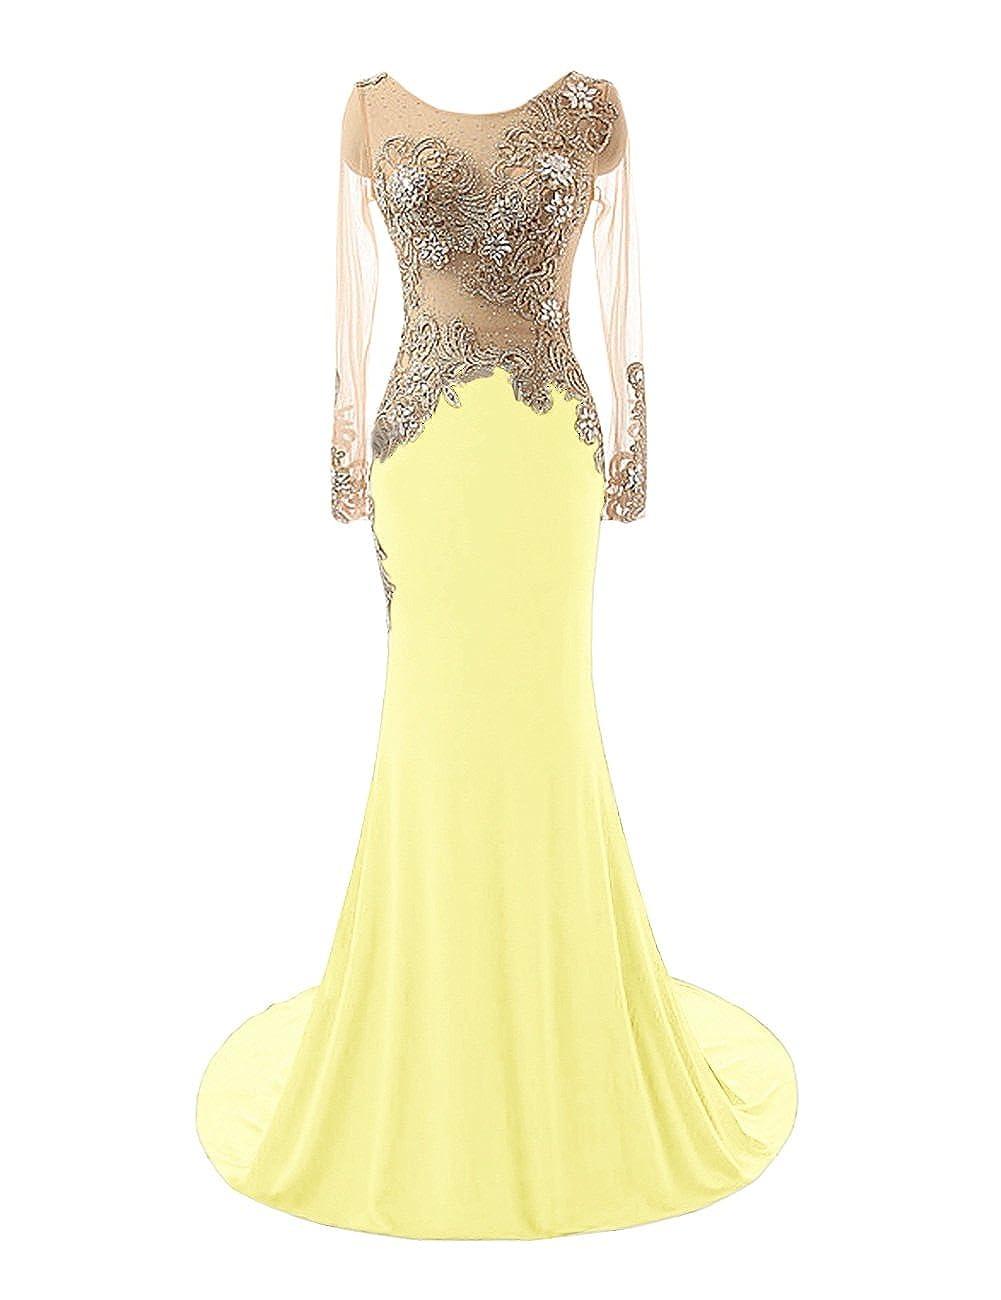 Daffodil Bess Bridal Women's Mermaid Beaded Sheer Long Sleeves Prom Evening Dresses